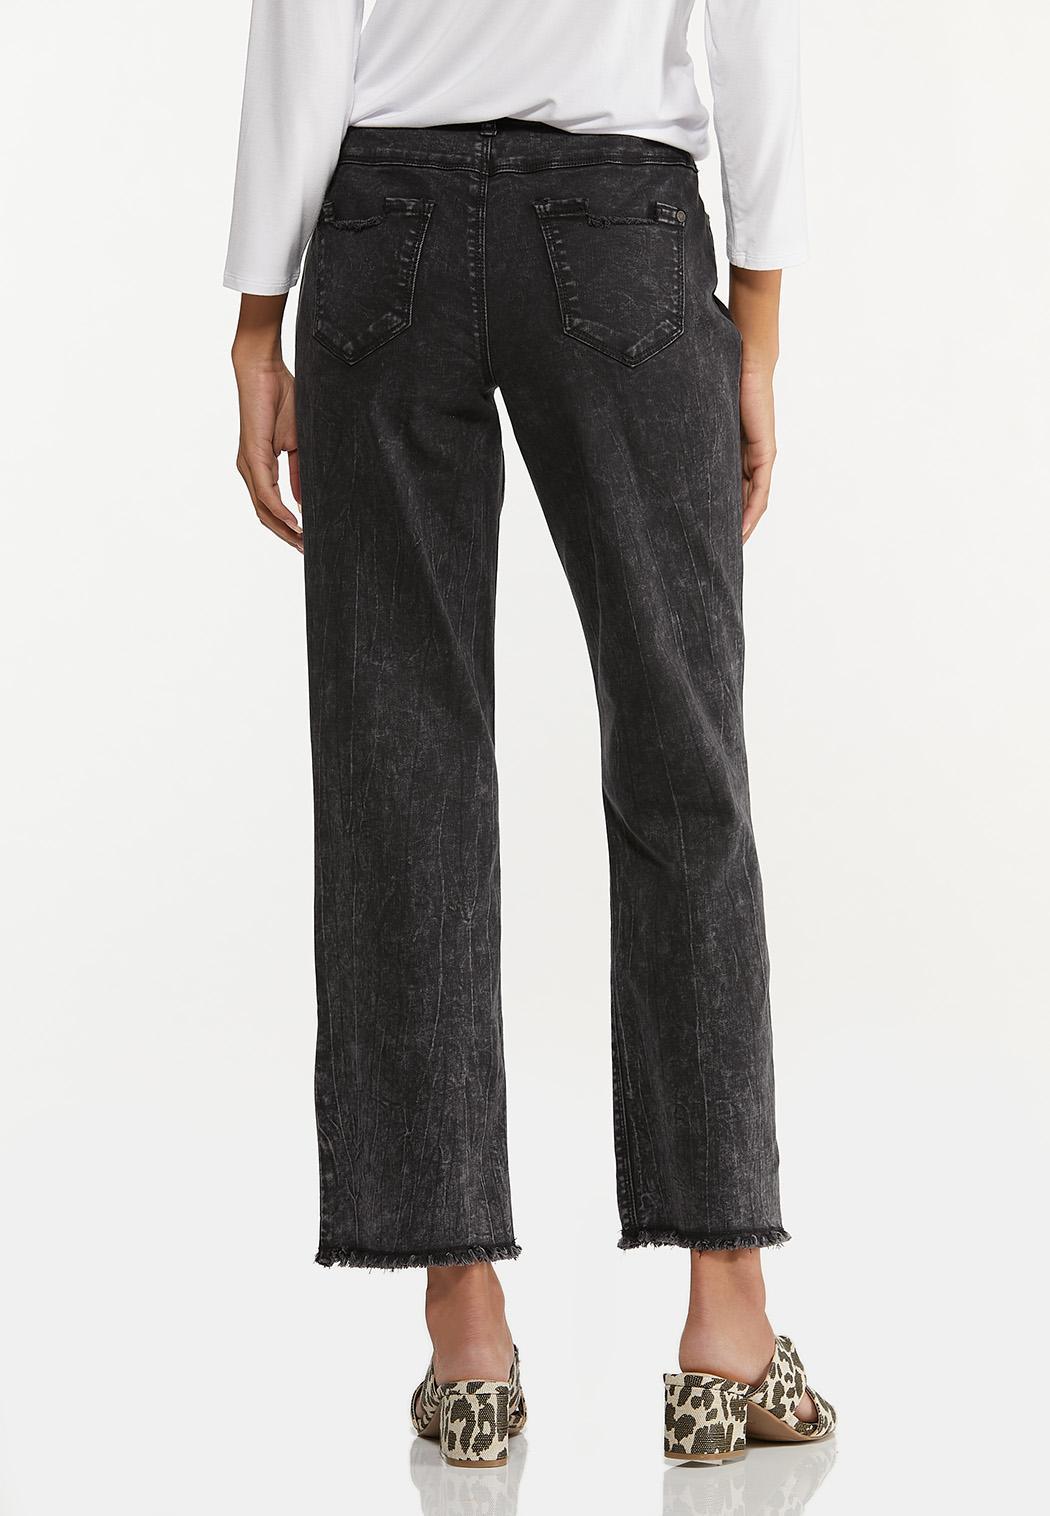 Distressed Black Acid Wash Jeans (Item #44629442)